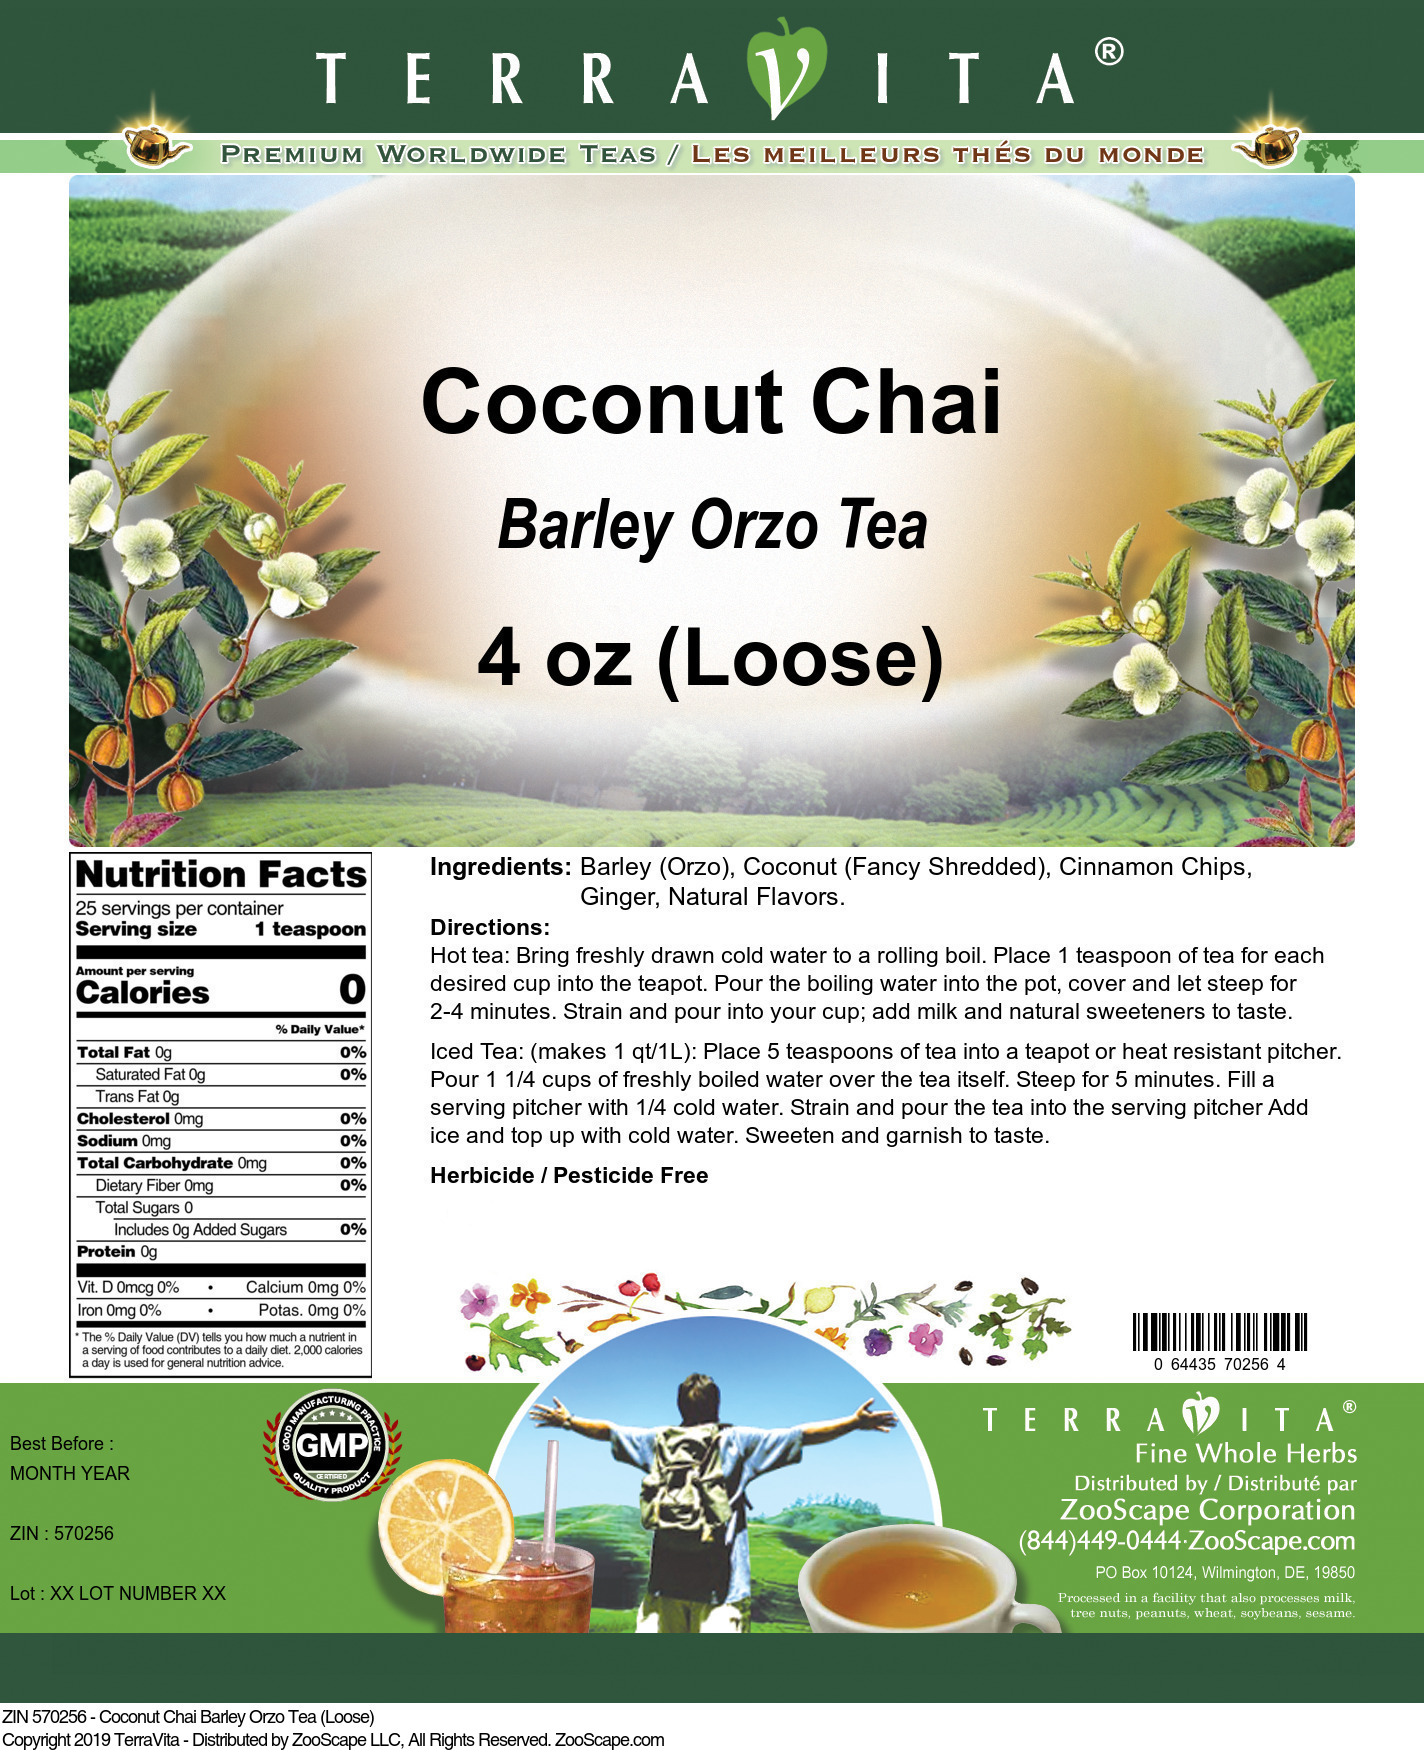 Coconut Chai Barley Orzo Tea (Loose)